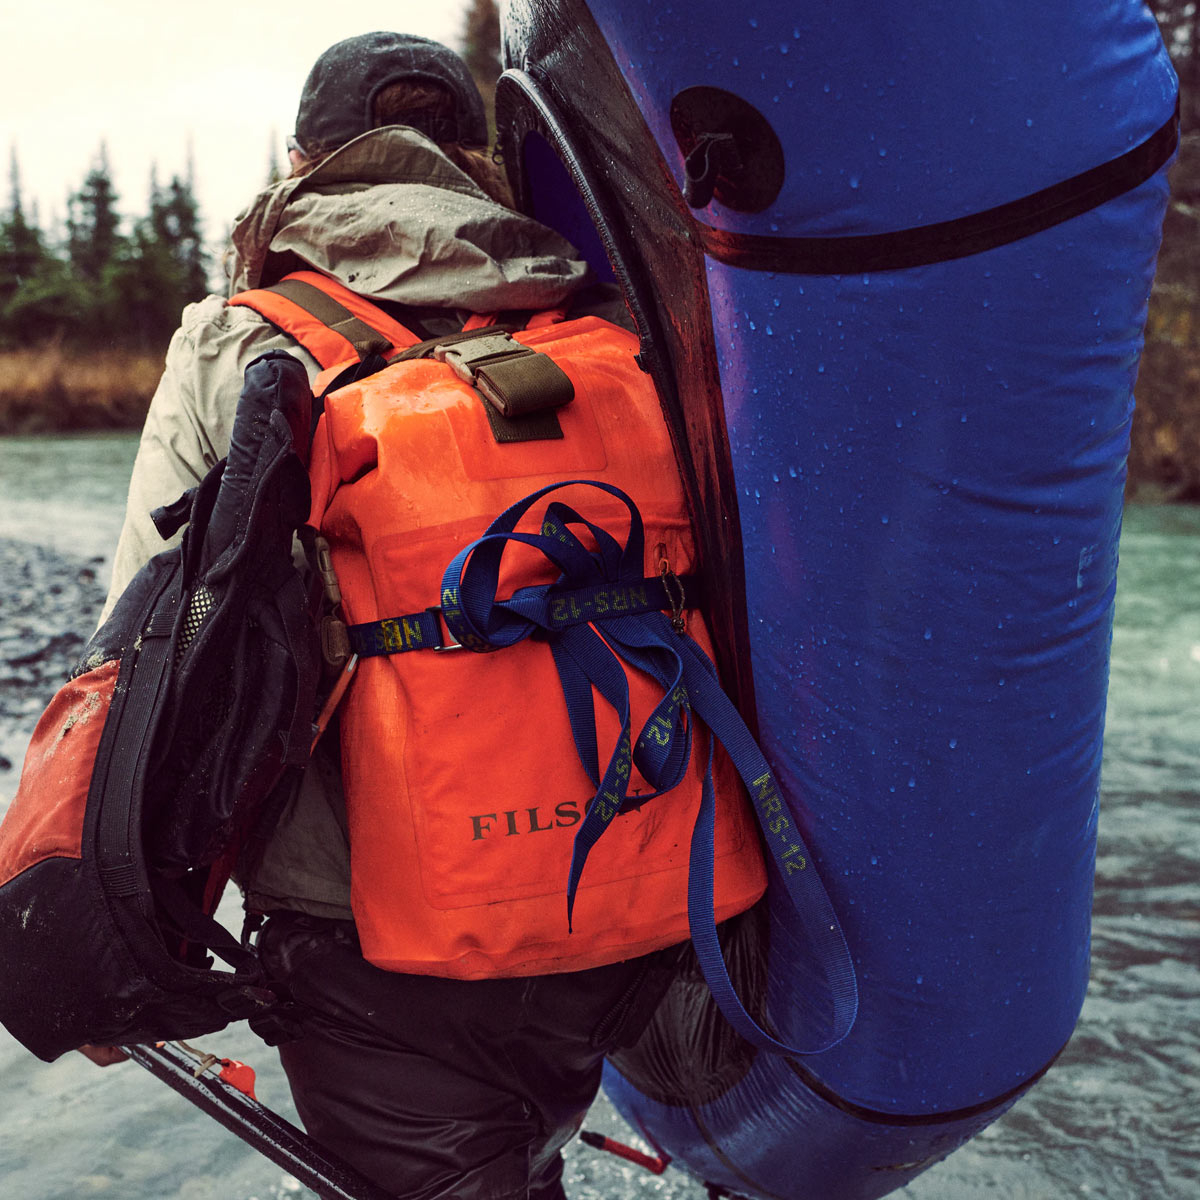 Filson Dry Backpack Flame, houdt je uitrusting droog in alle weersomstandigheden